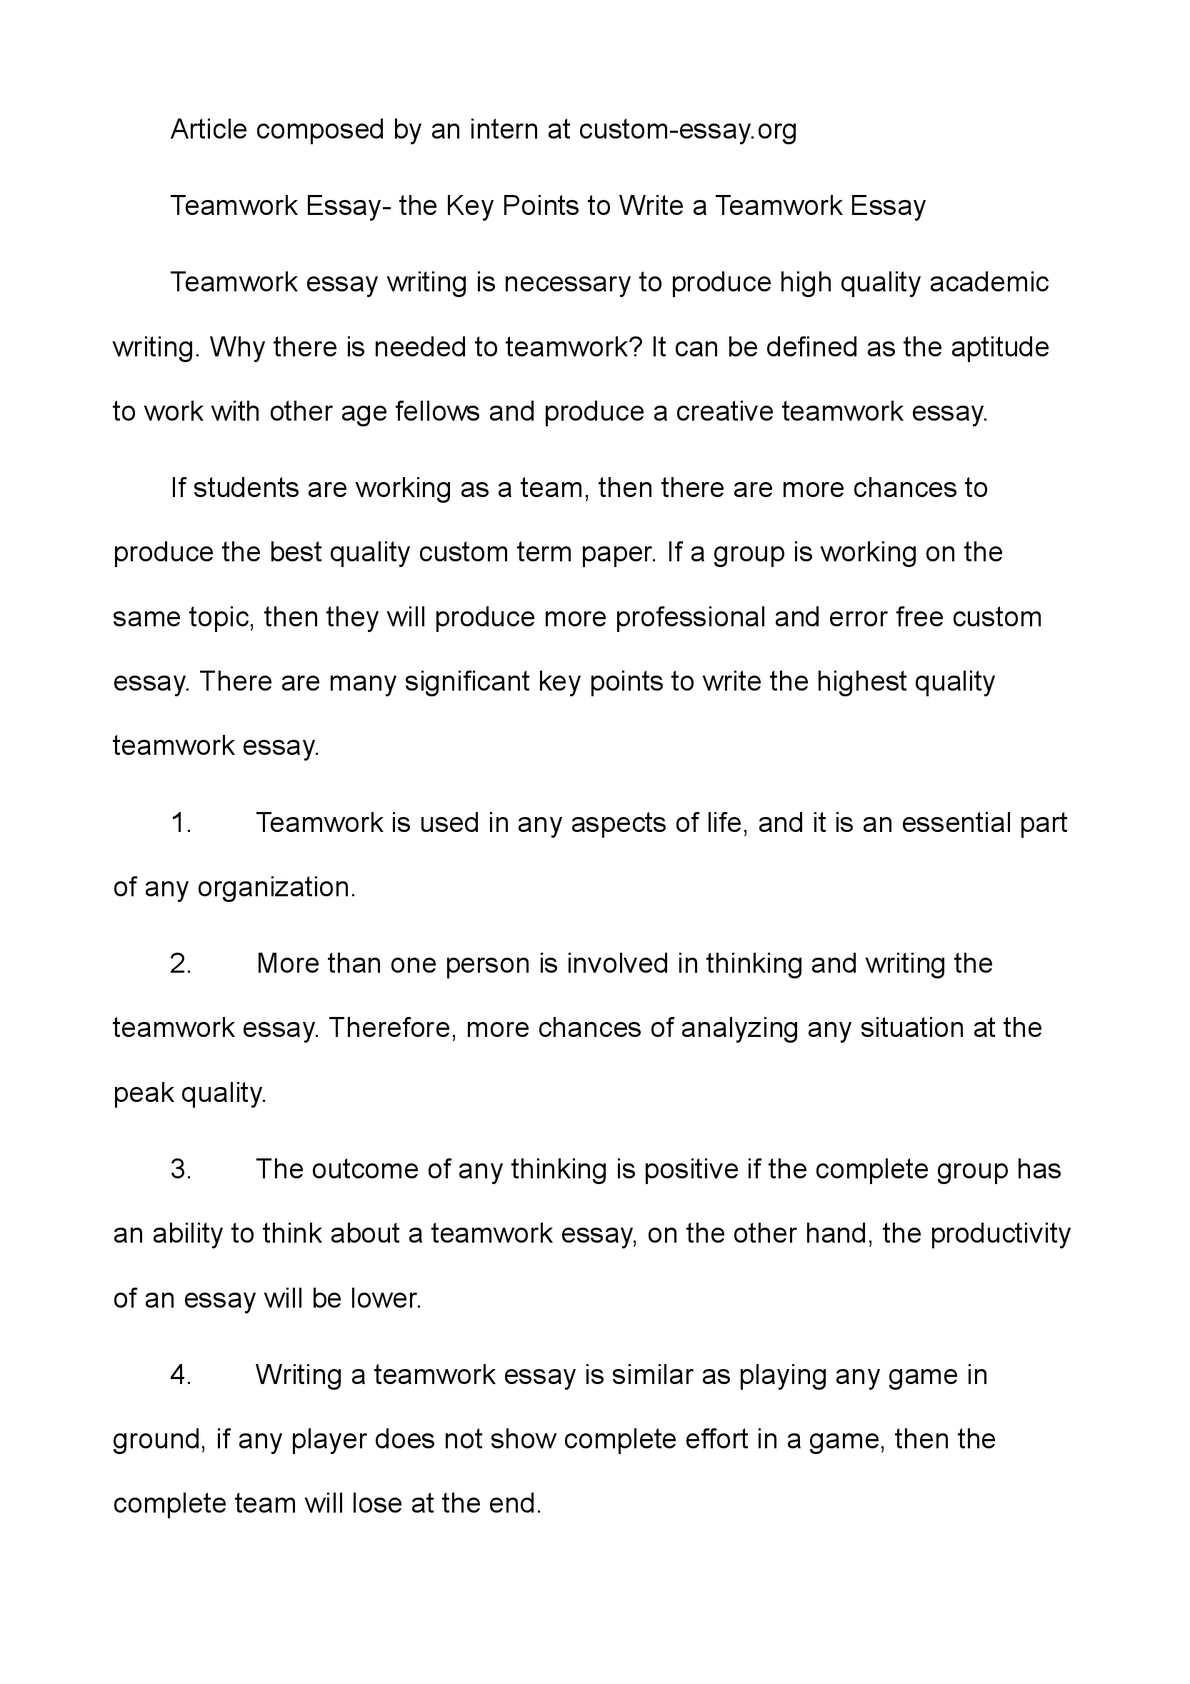 The key points essay